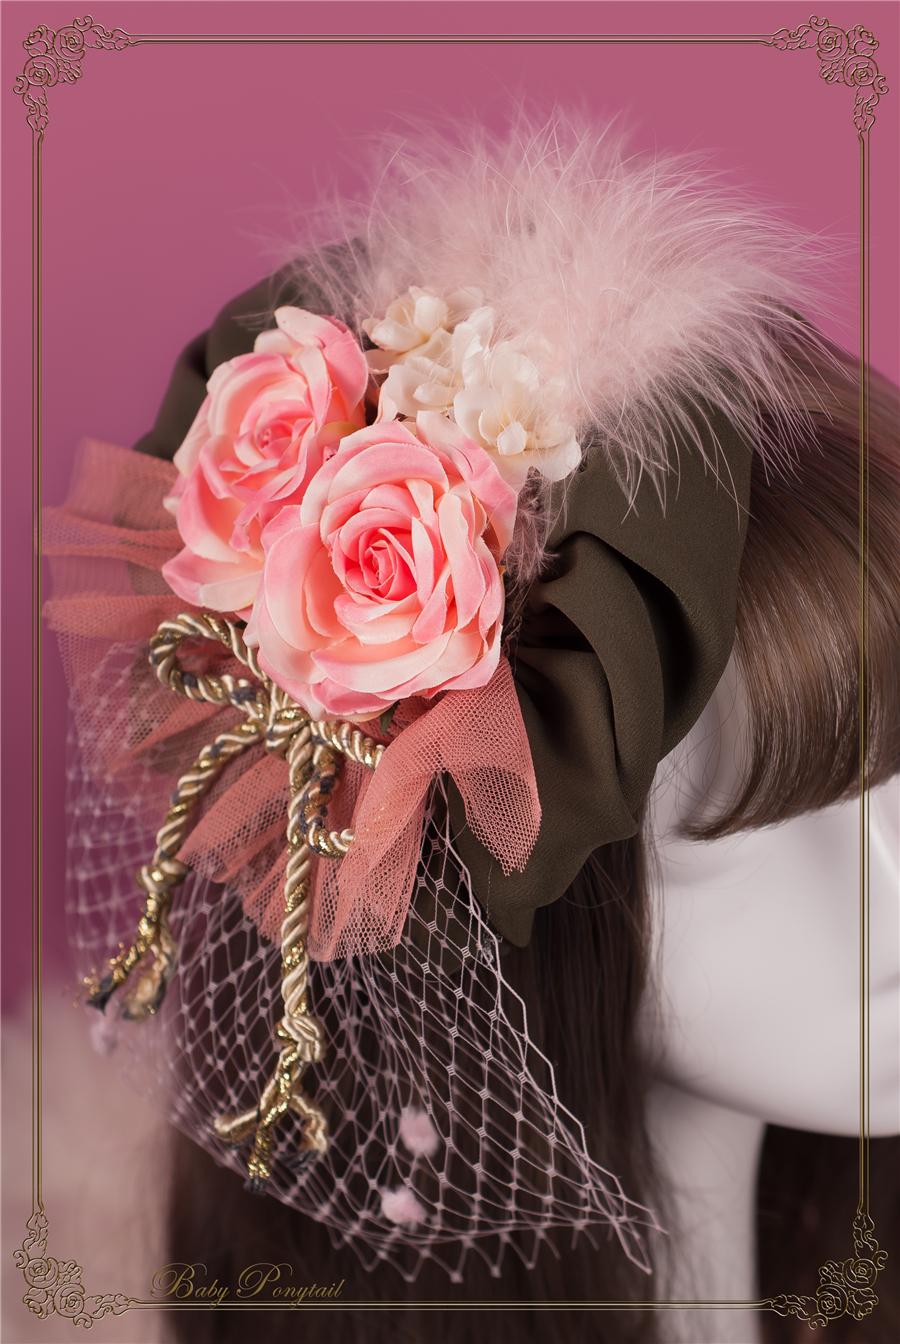 Babyponytail_Accessory_Victorian Garden Head Dress_3.jpg